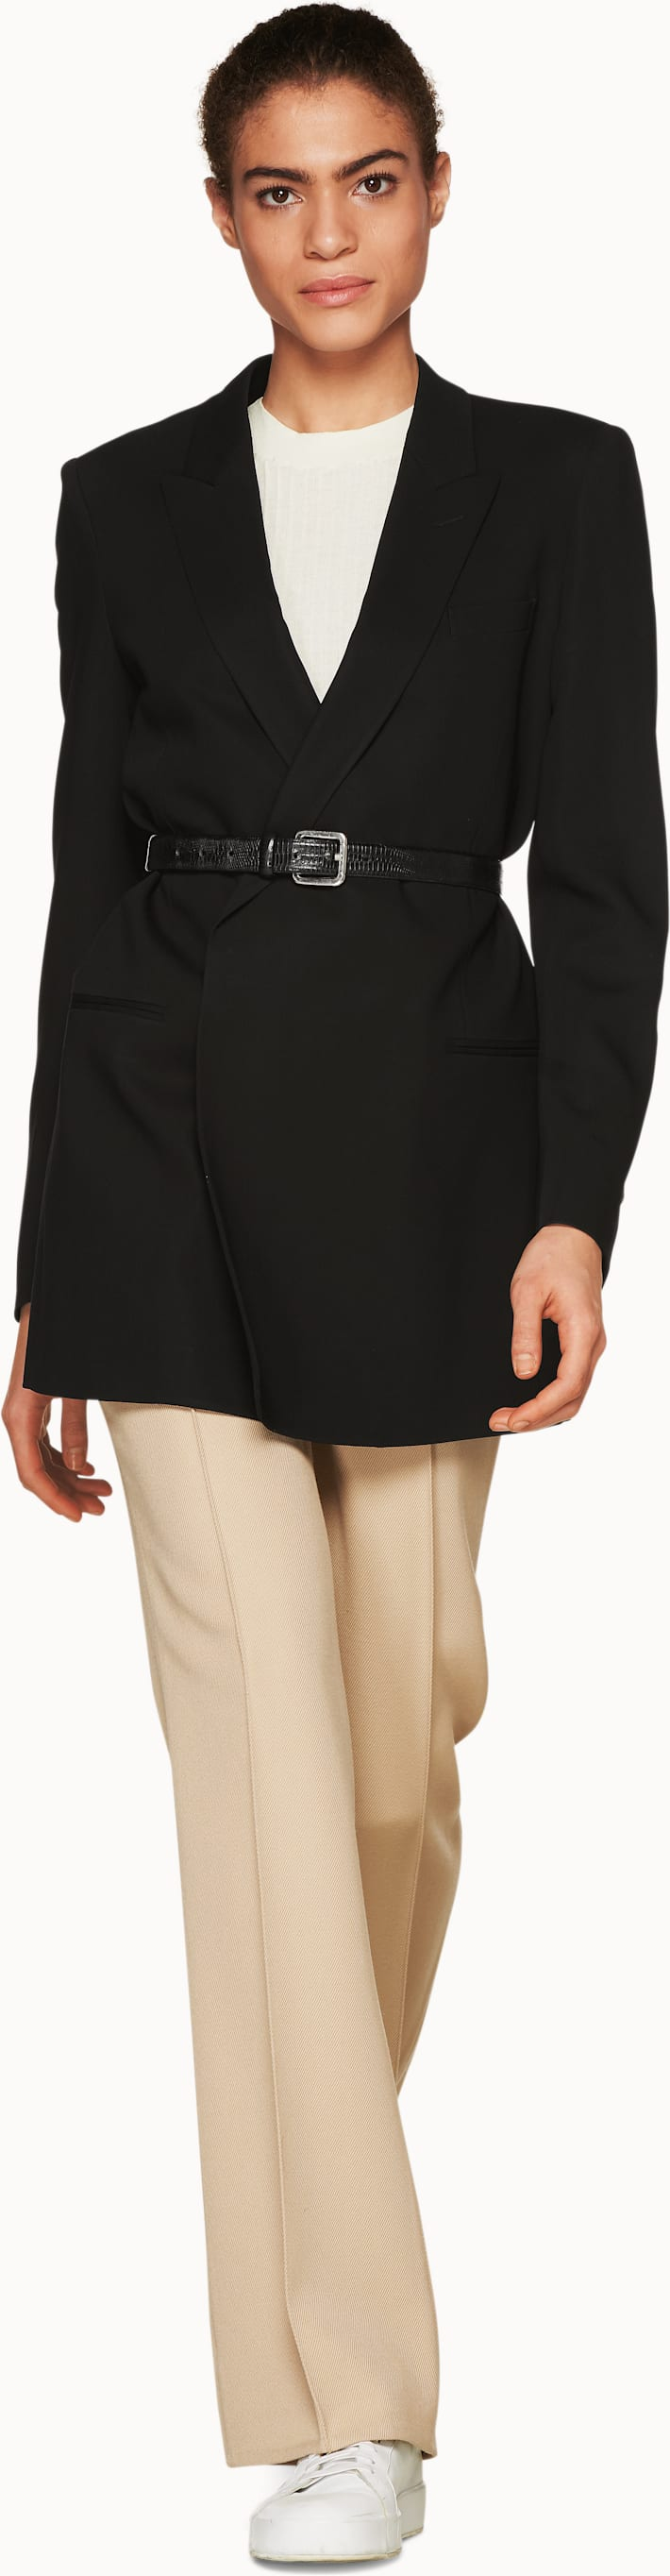 Tory Black Plain Jacket